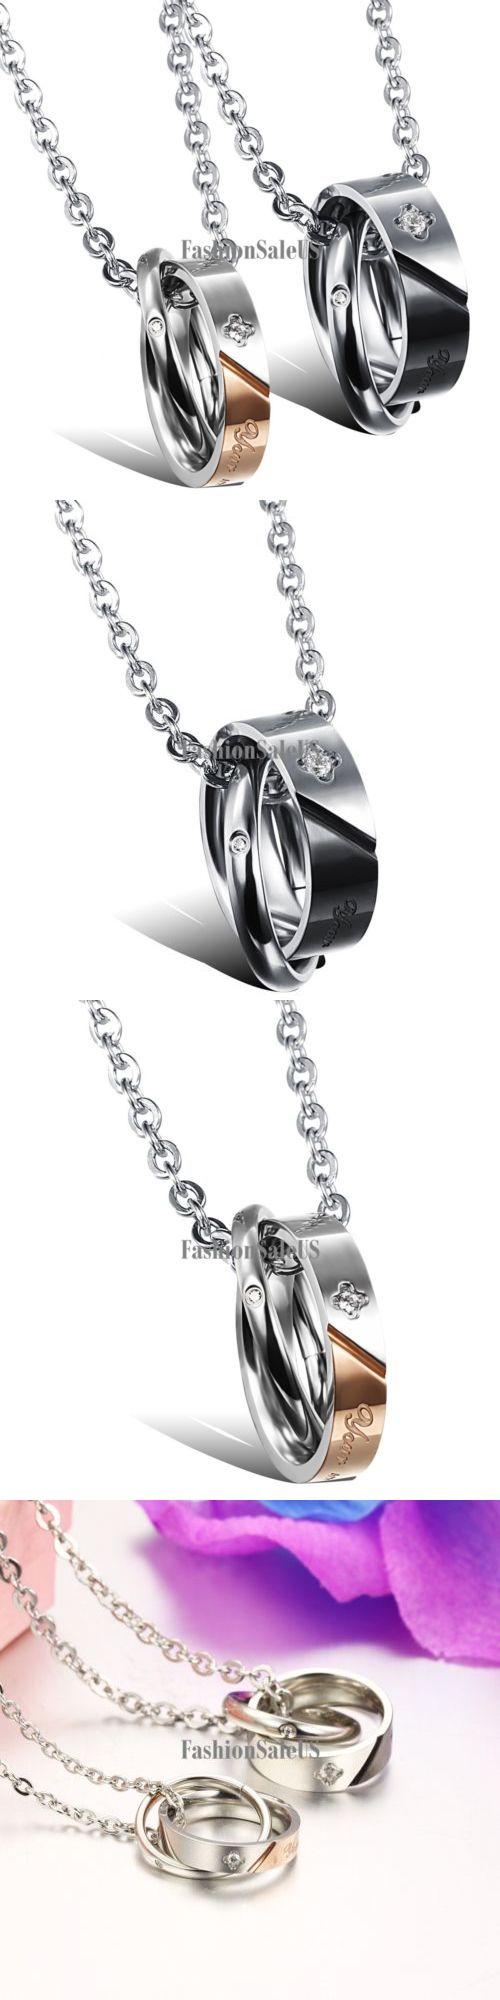 Best 25+ Couple necklaces ideas on Pinterest   Initial necklaces ...